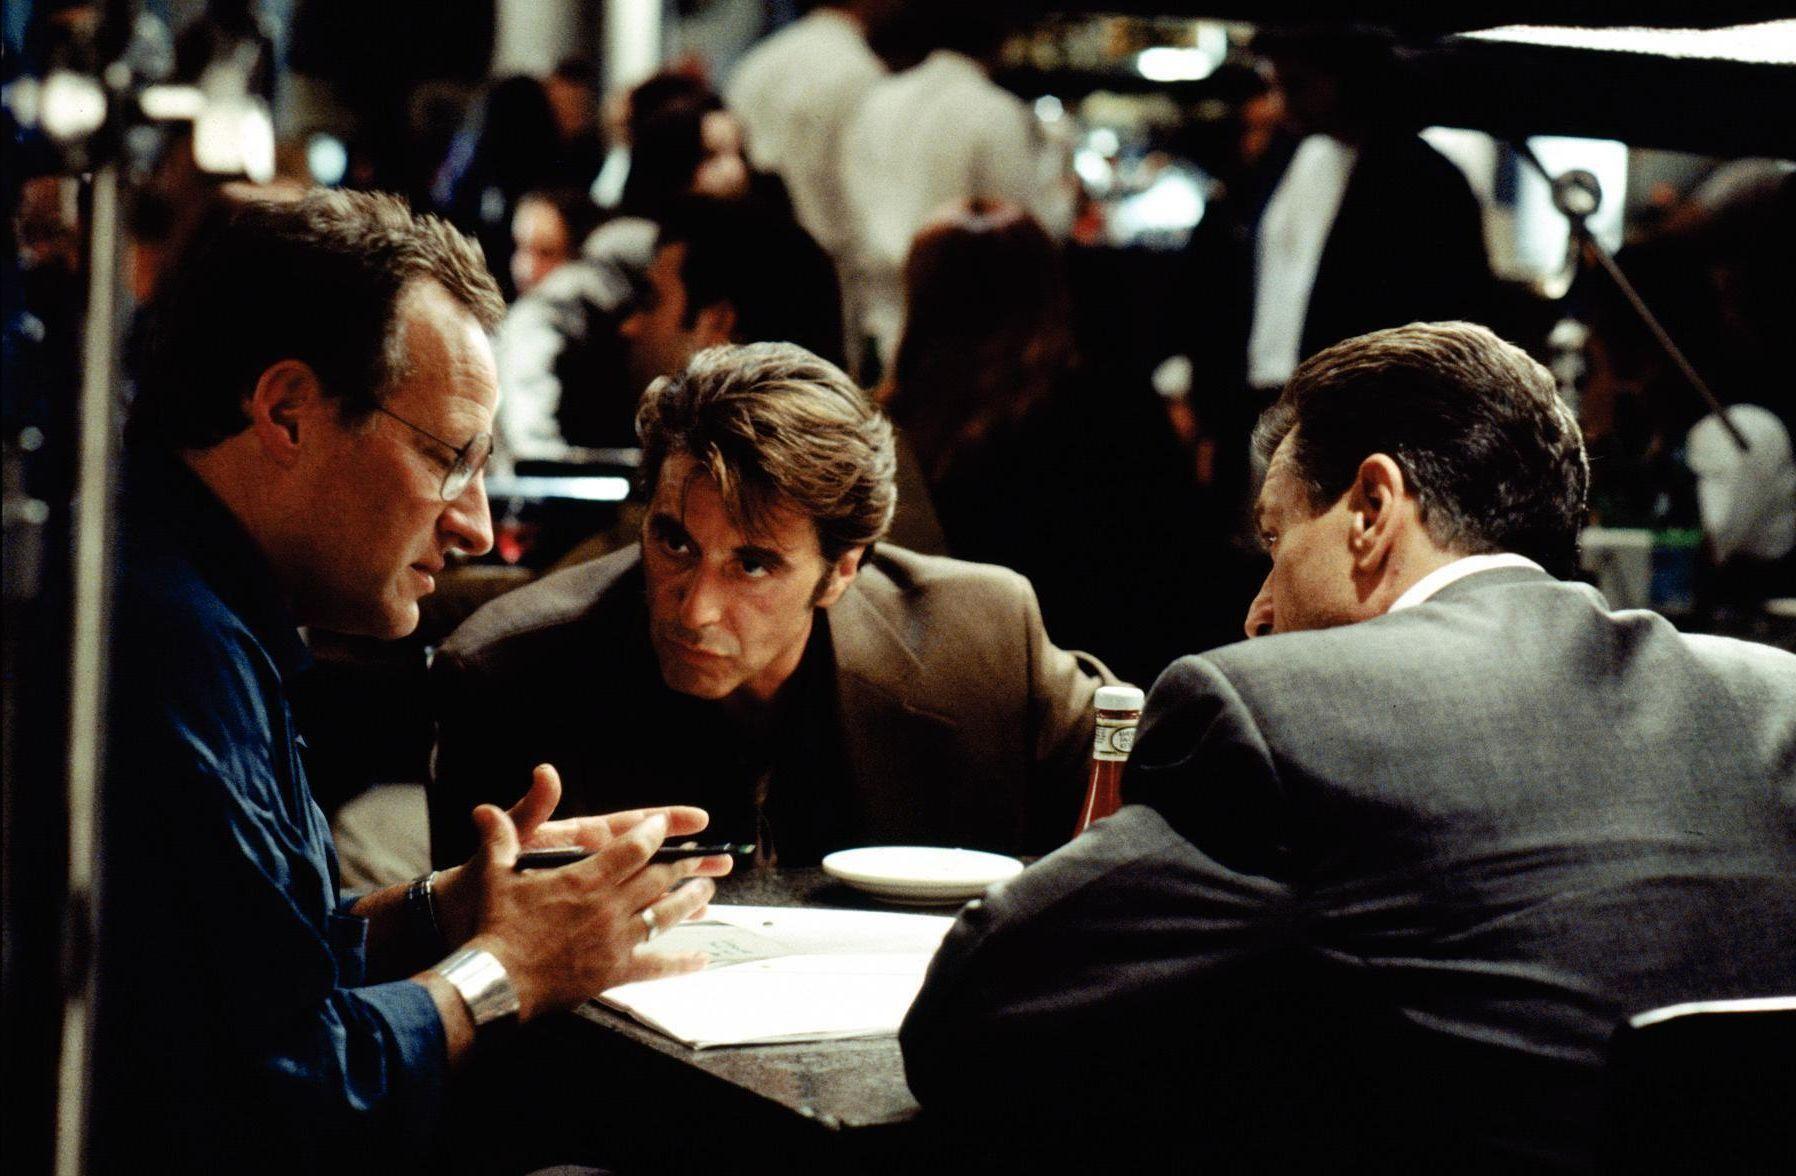 Heat Q&A with Michael Mann, Al Pacino, and Robert De Niro ...